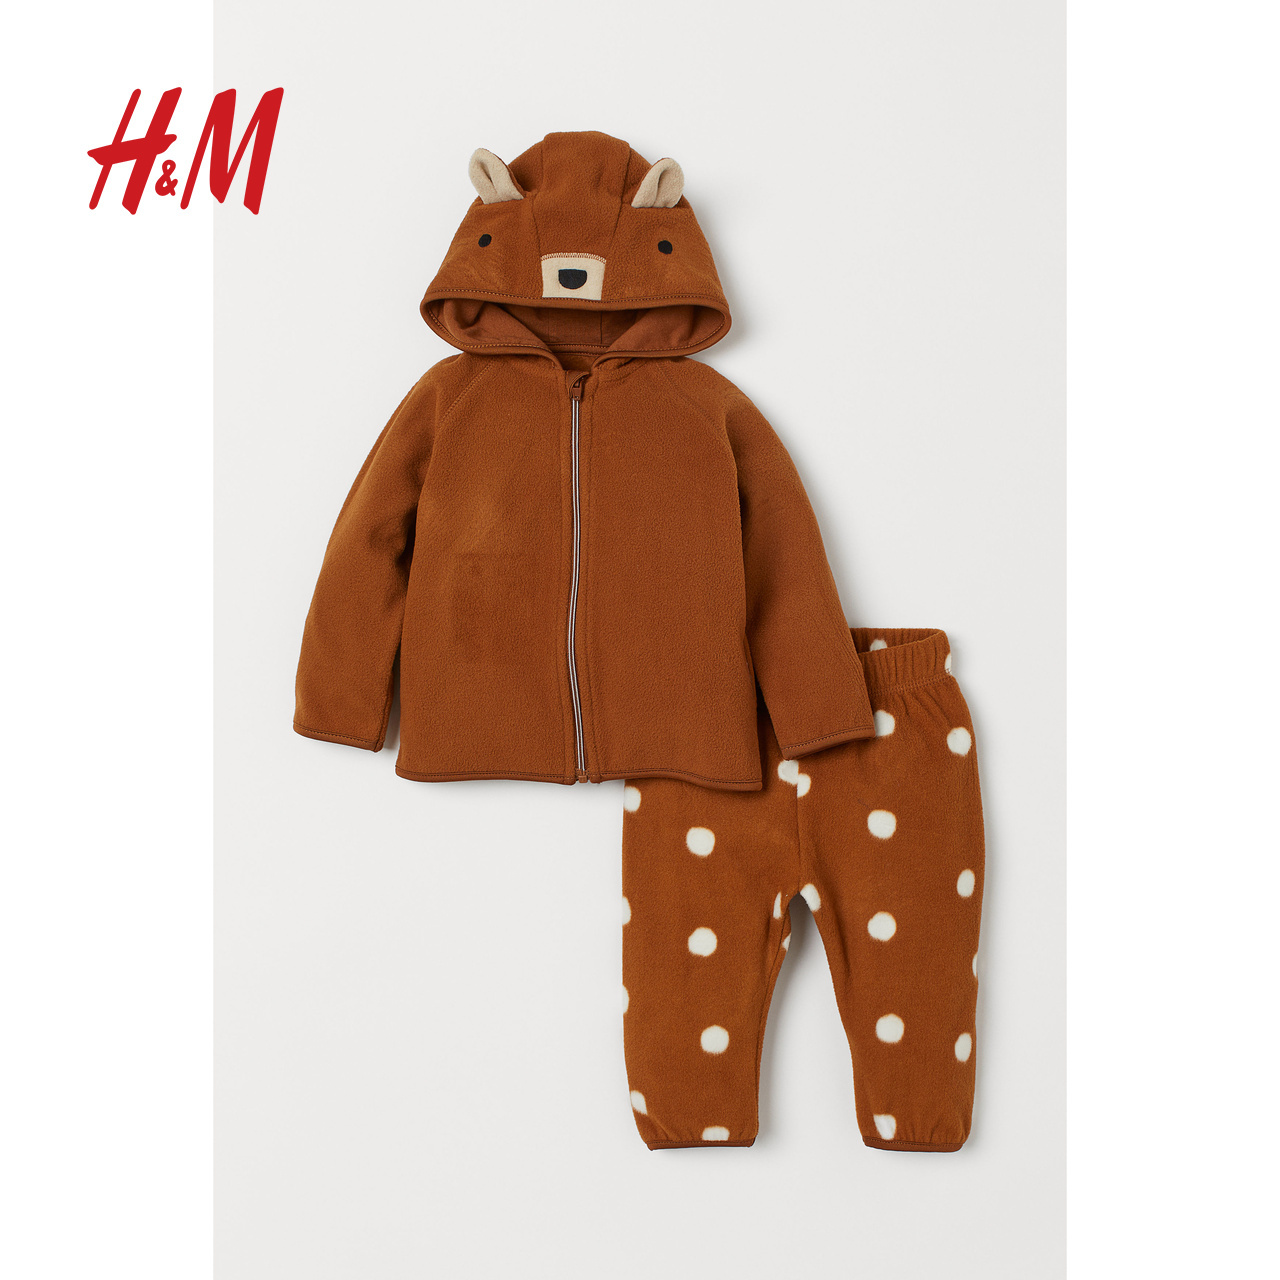 HM 童装婴儿宝宝套装2019秋冬新款抓绒外套和长裤   0803586